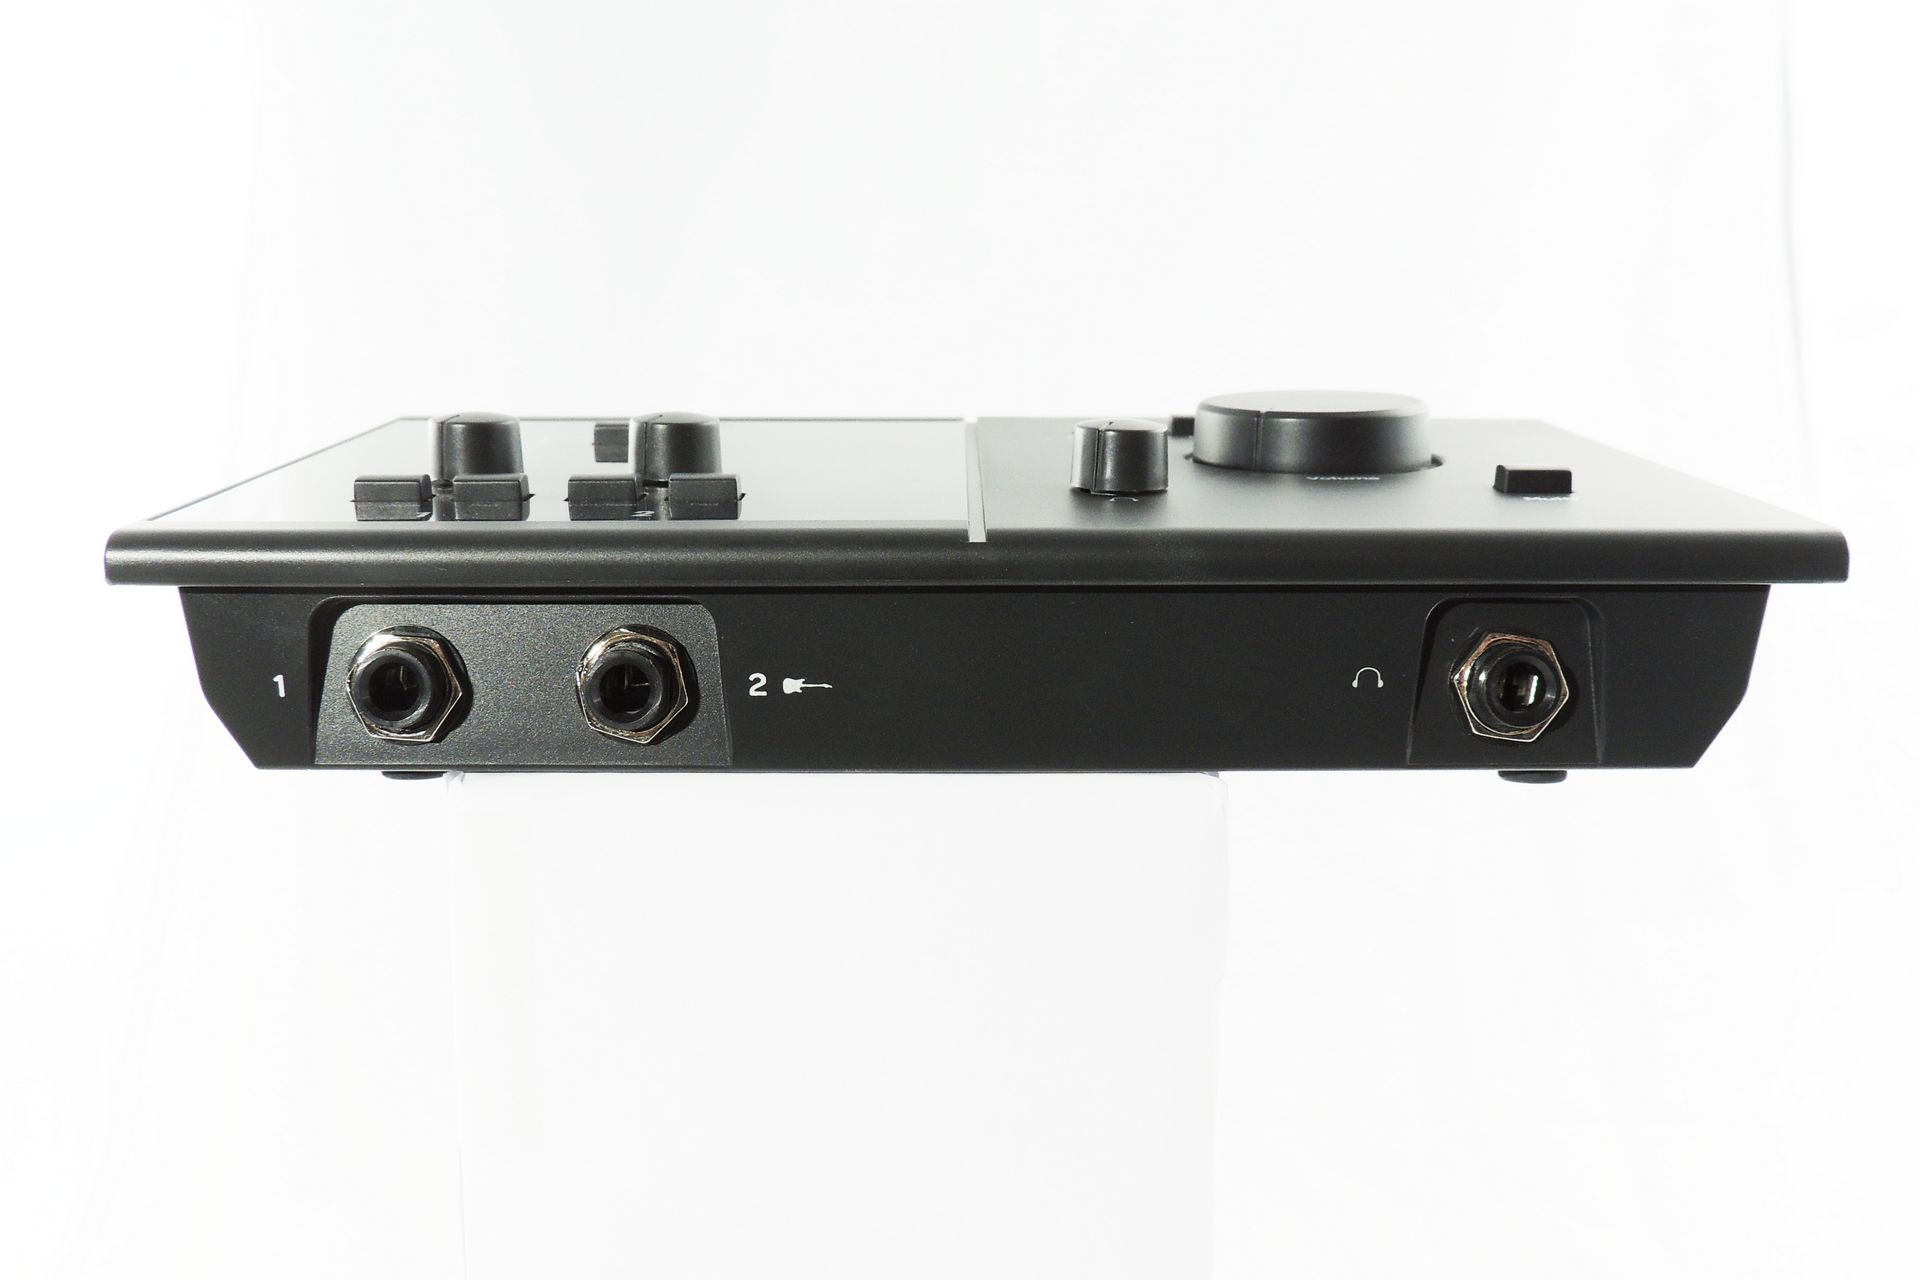 M-Audio Fast Track C400 USB audio / MIDI interace for sale at Plasma Music